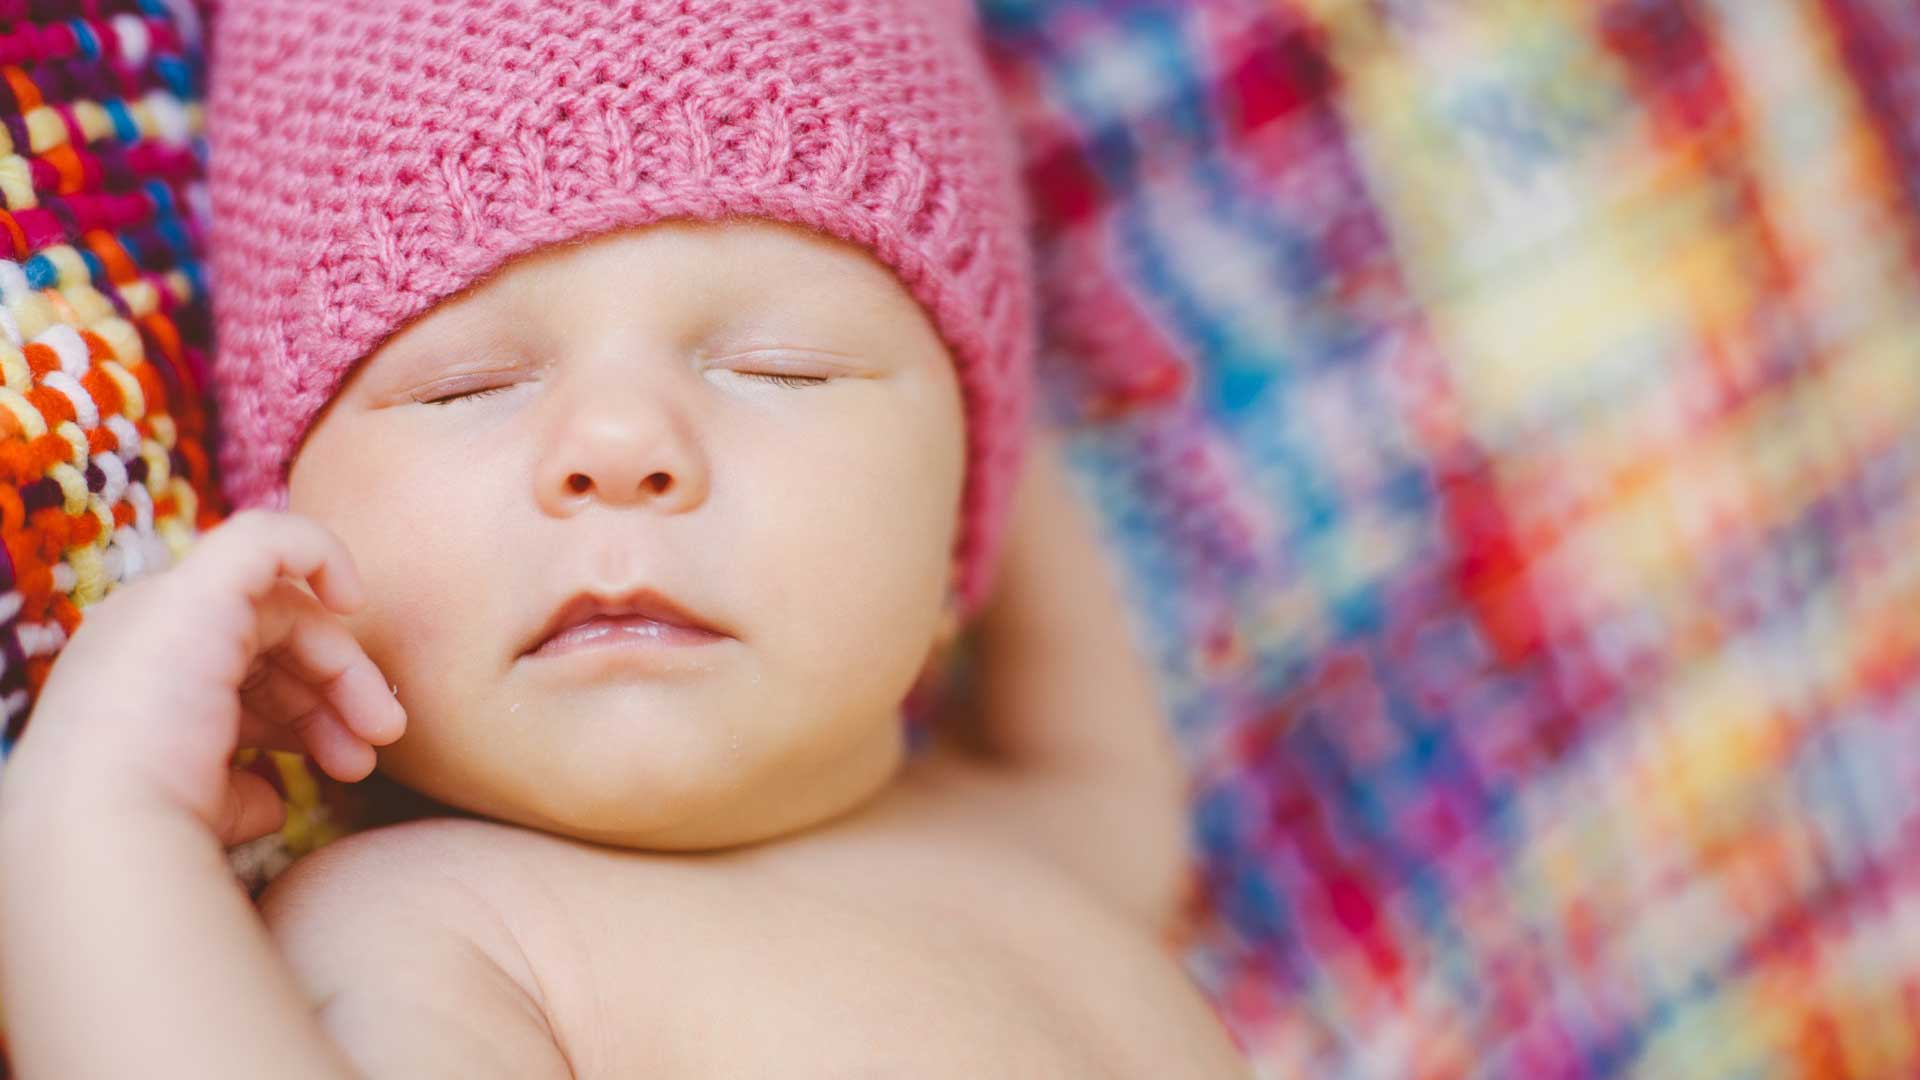 foto-bebe-fotografia-new-born-recien-nacidos-foto-familia-sesion-zahira-12 Sesiones de Fotos - video boda cadiz